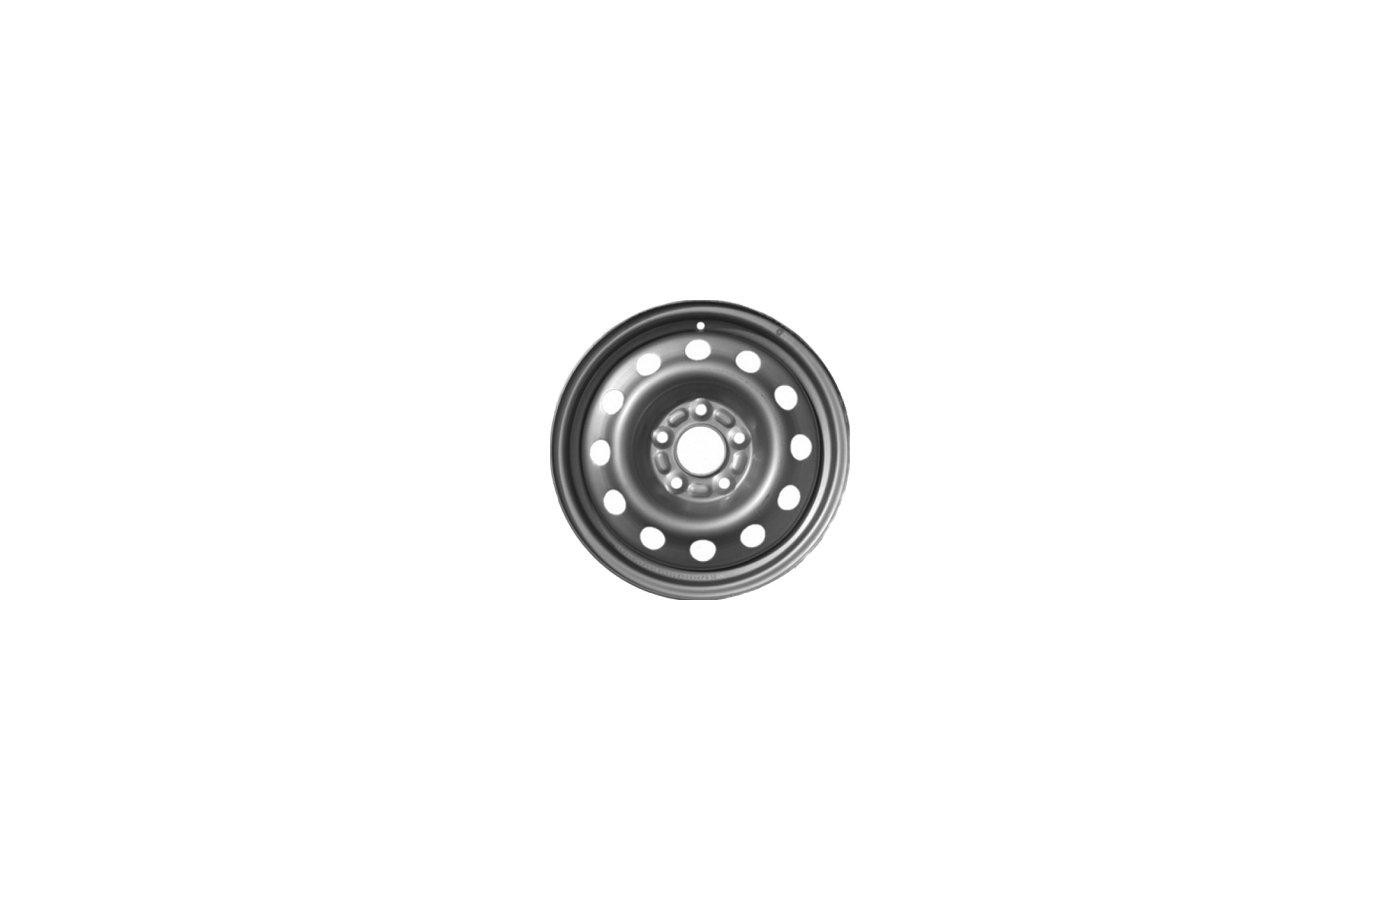 Диск ТЗСК Renault Duster 6.5x16/5x114.3 D66.1 ET50 Металлик